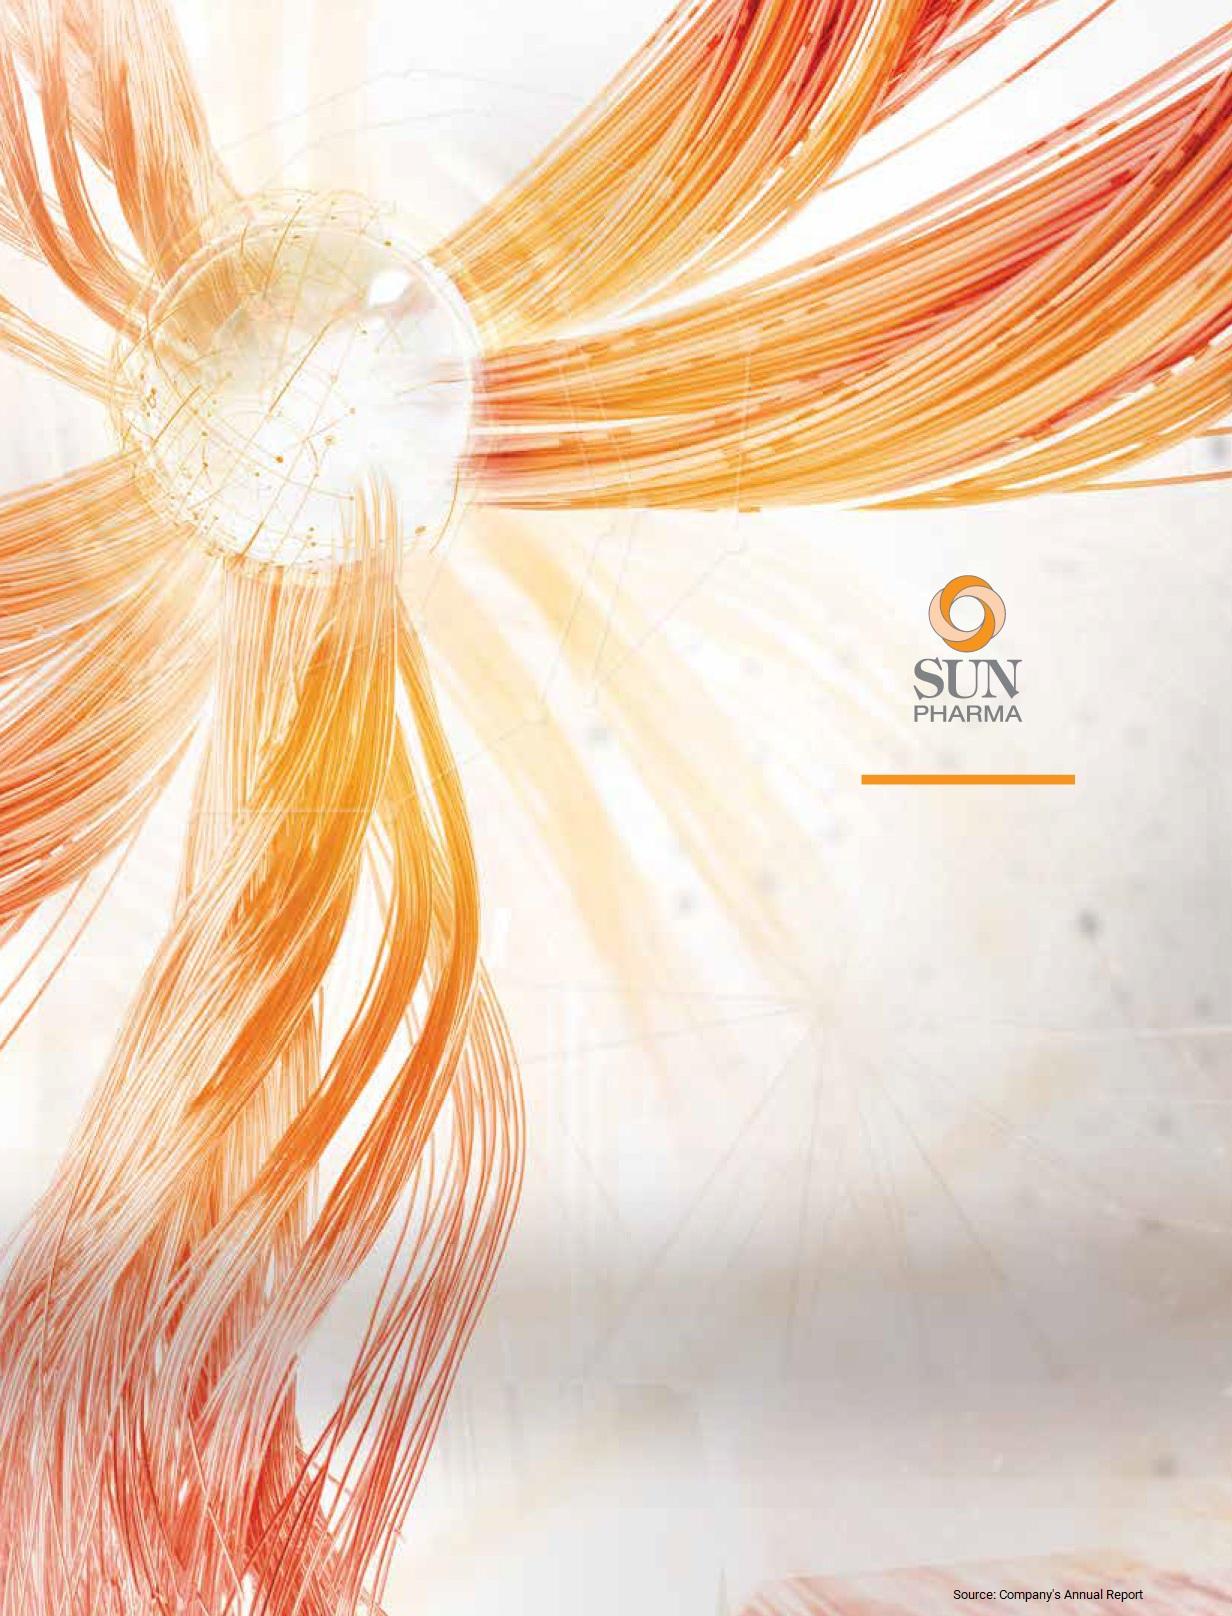 Ranbaxy-Sun-Pharma-acquisition-deal-impact